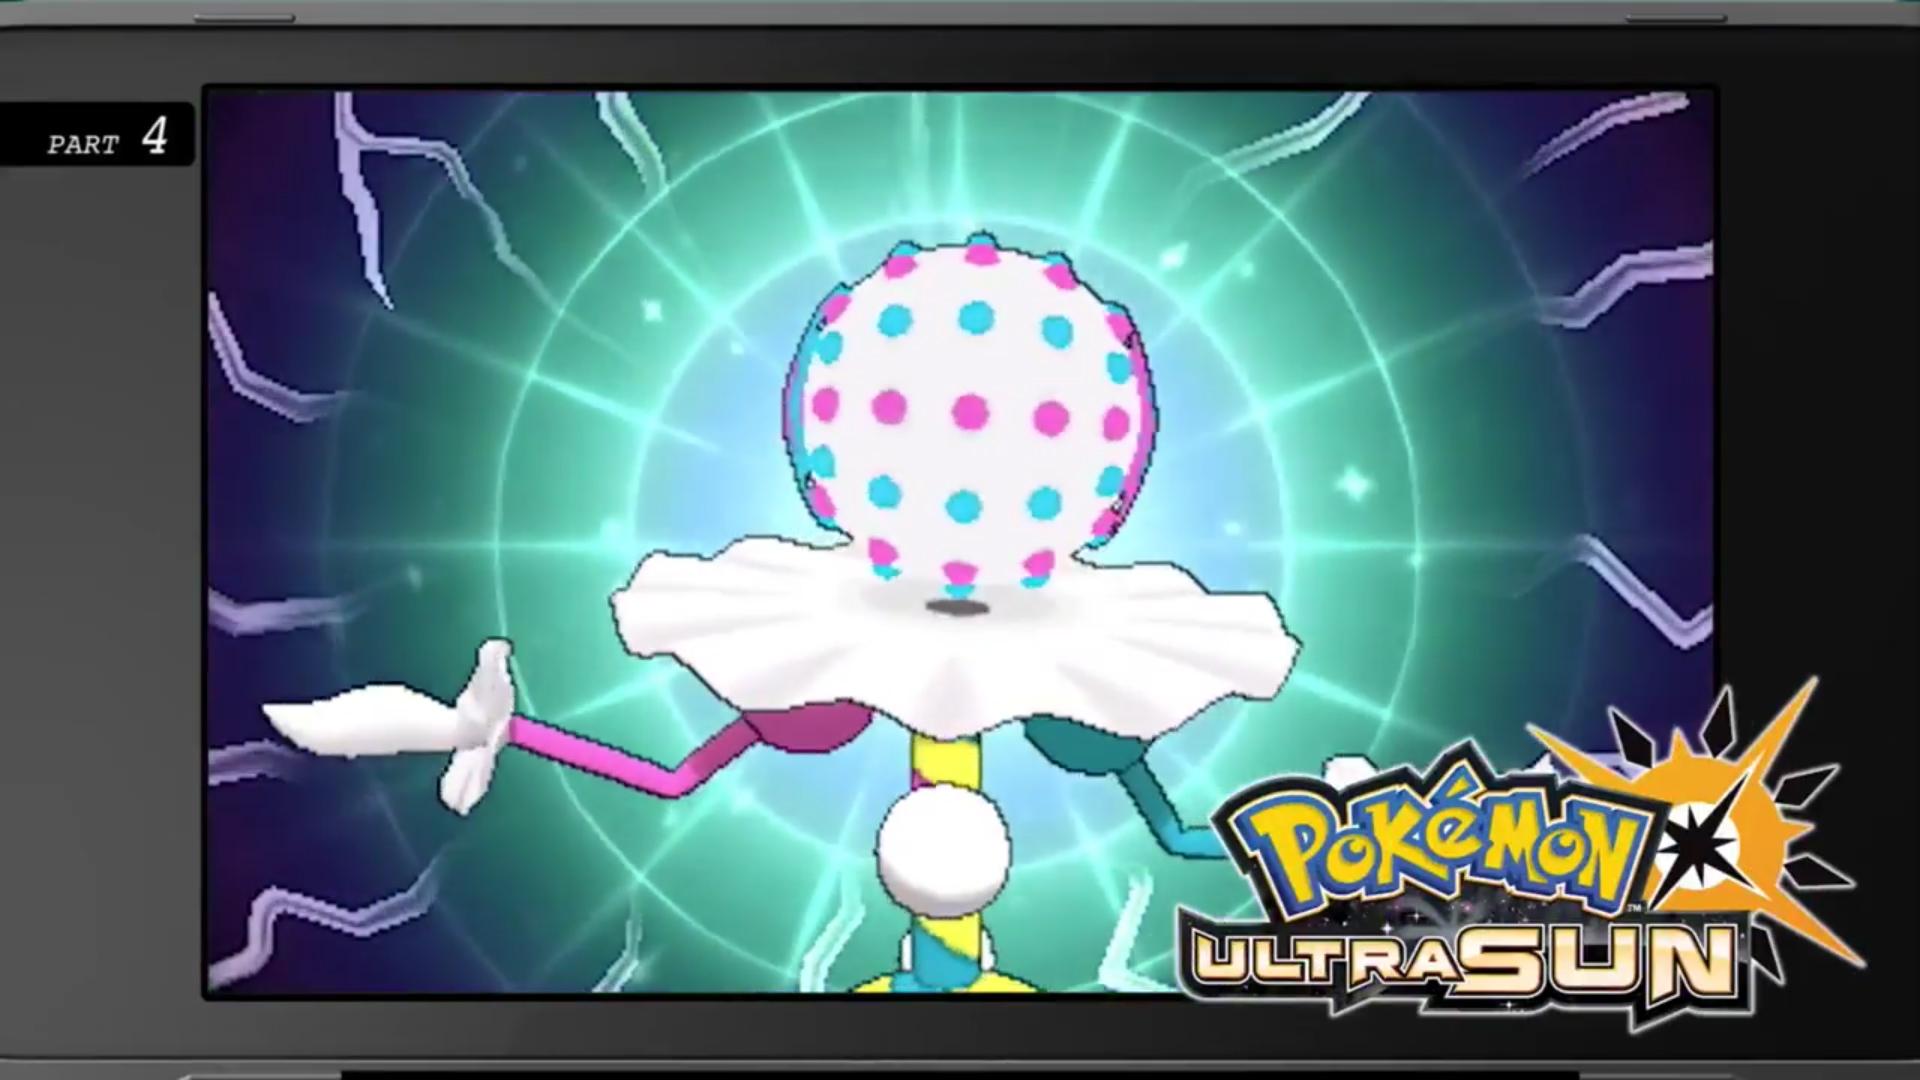 Nintendo Opens Latest Direct With Pokemon UltraSun/UltraMoon